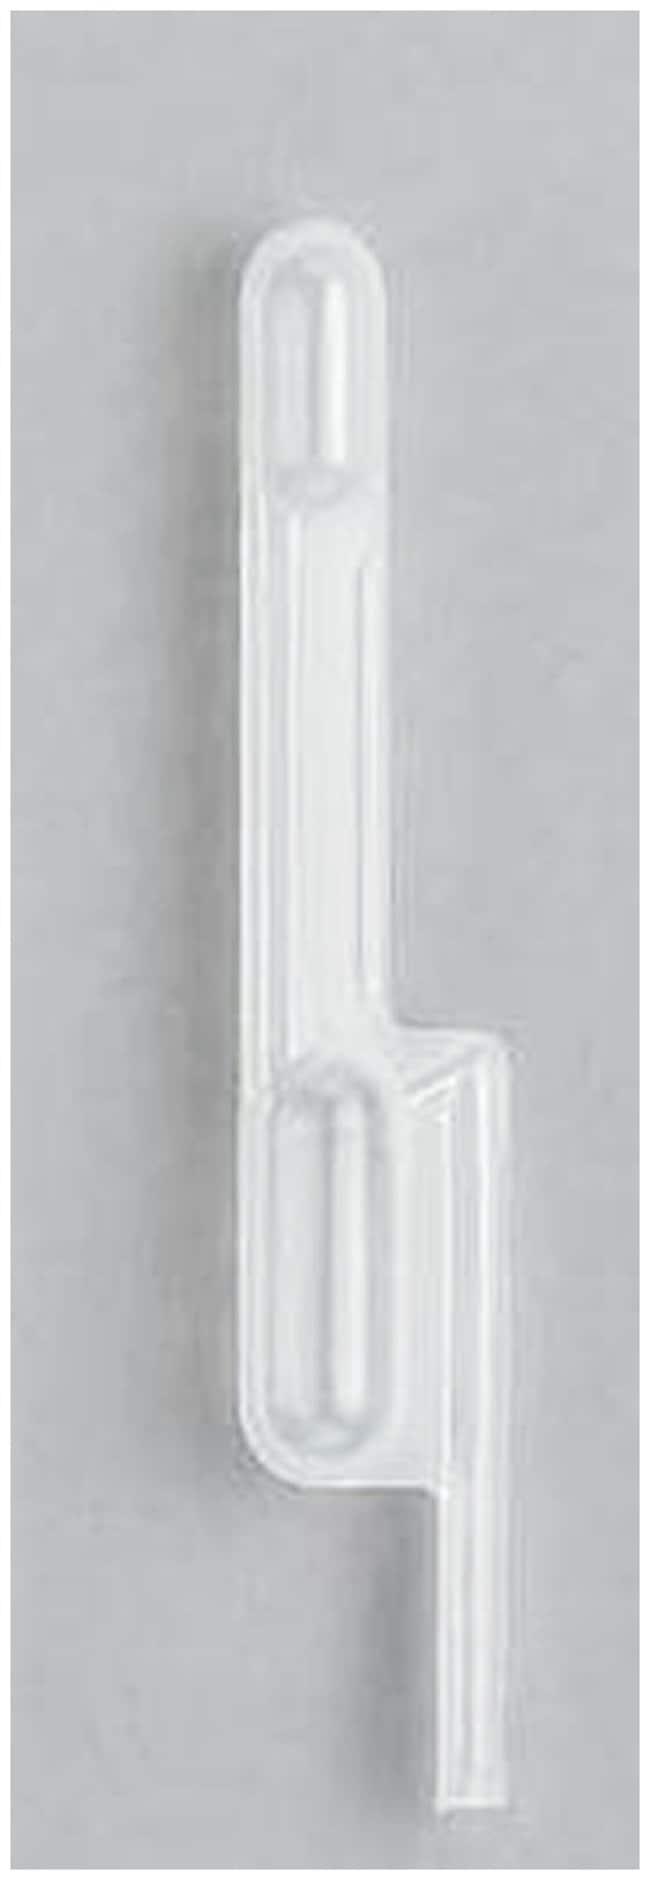 Thermo Scientific Samco Exact Volume Transfer Pipettes:Pipets, Pipettes